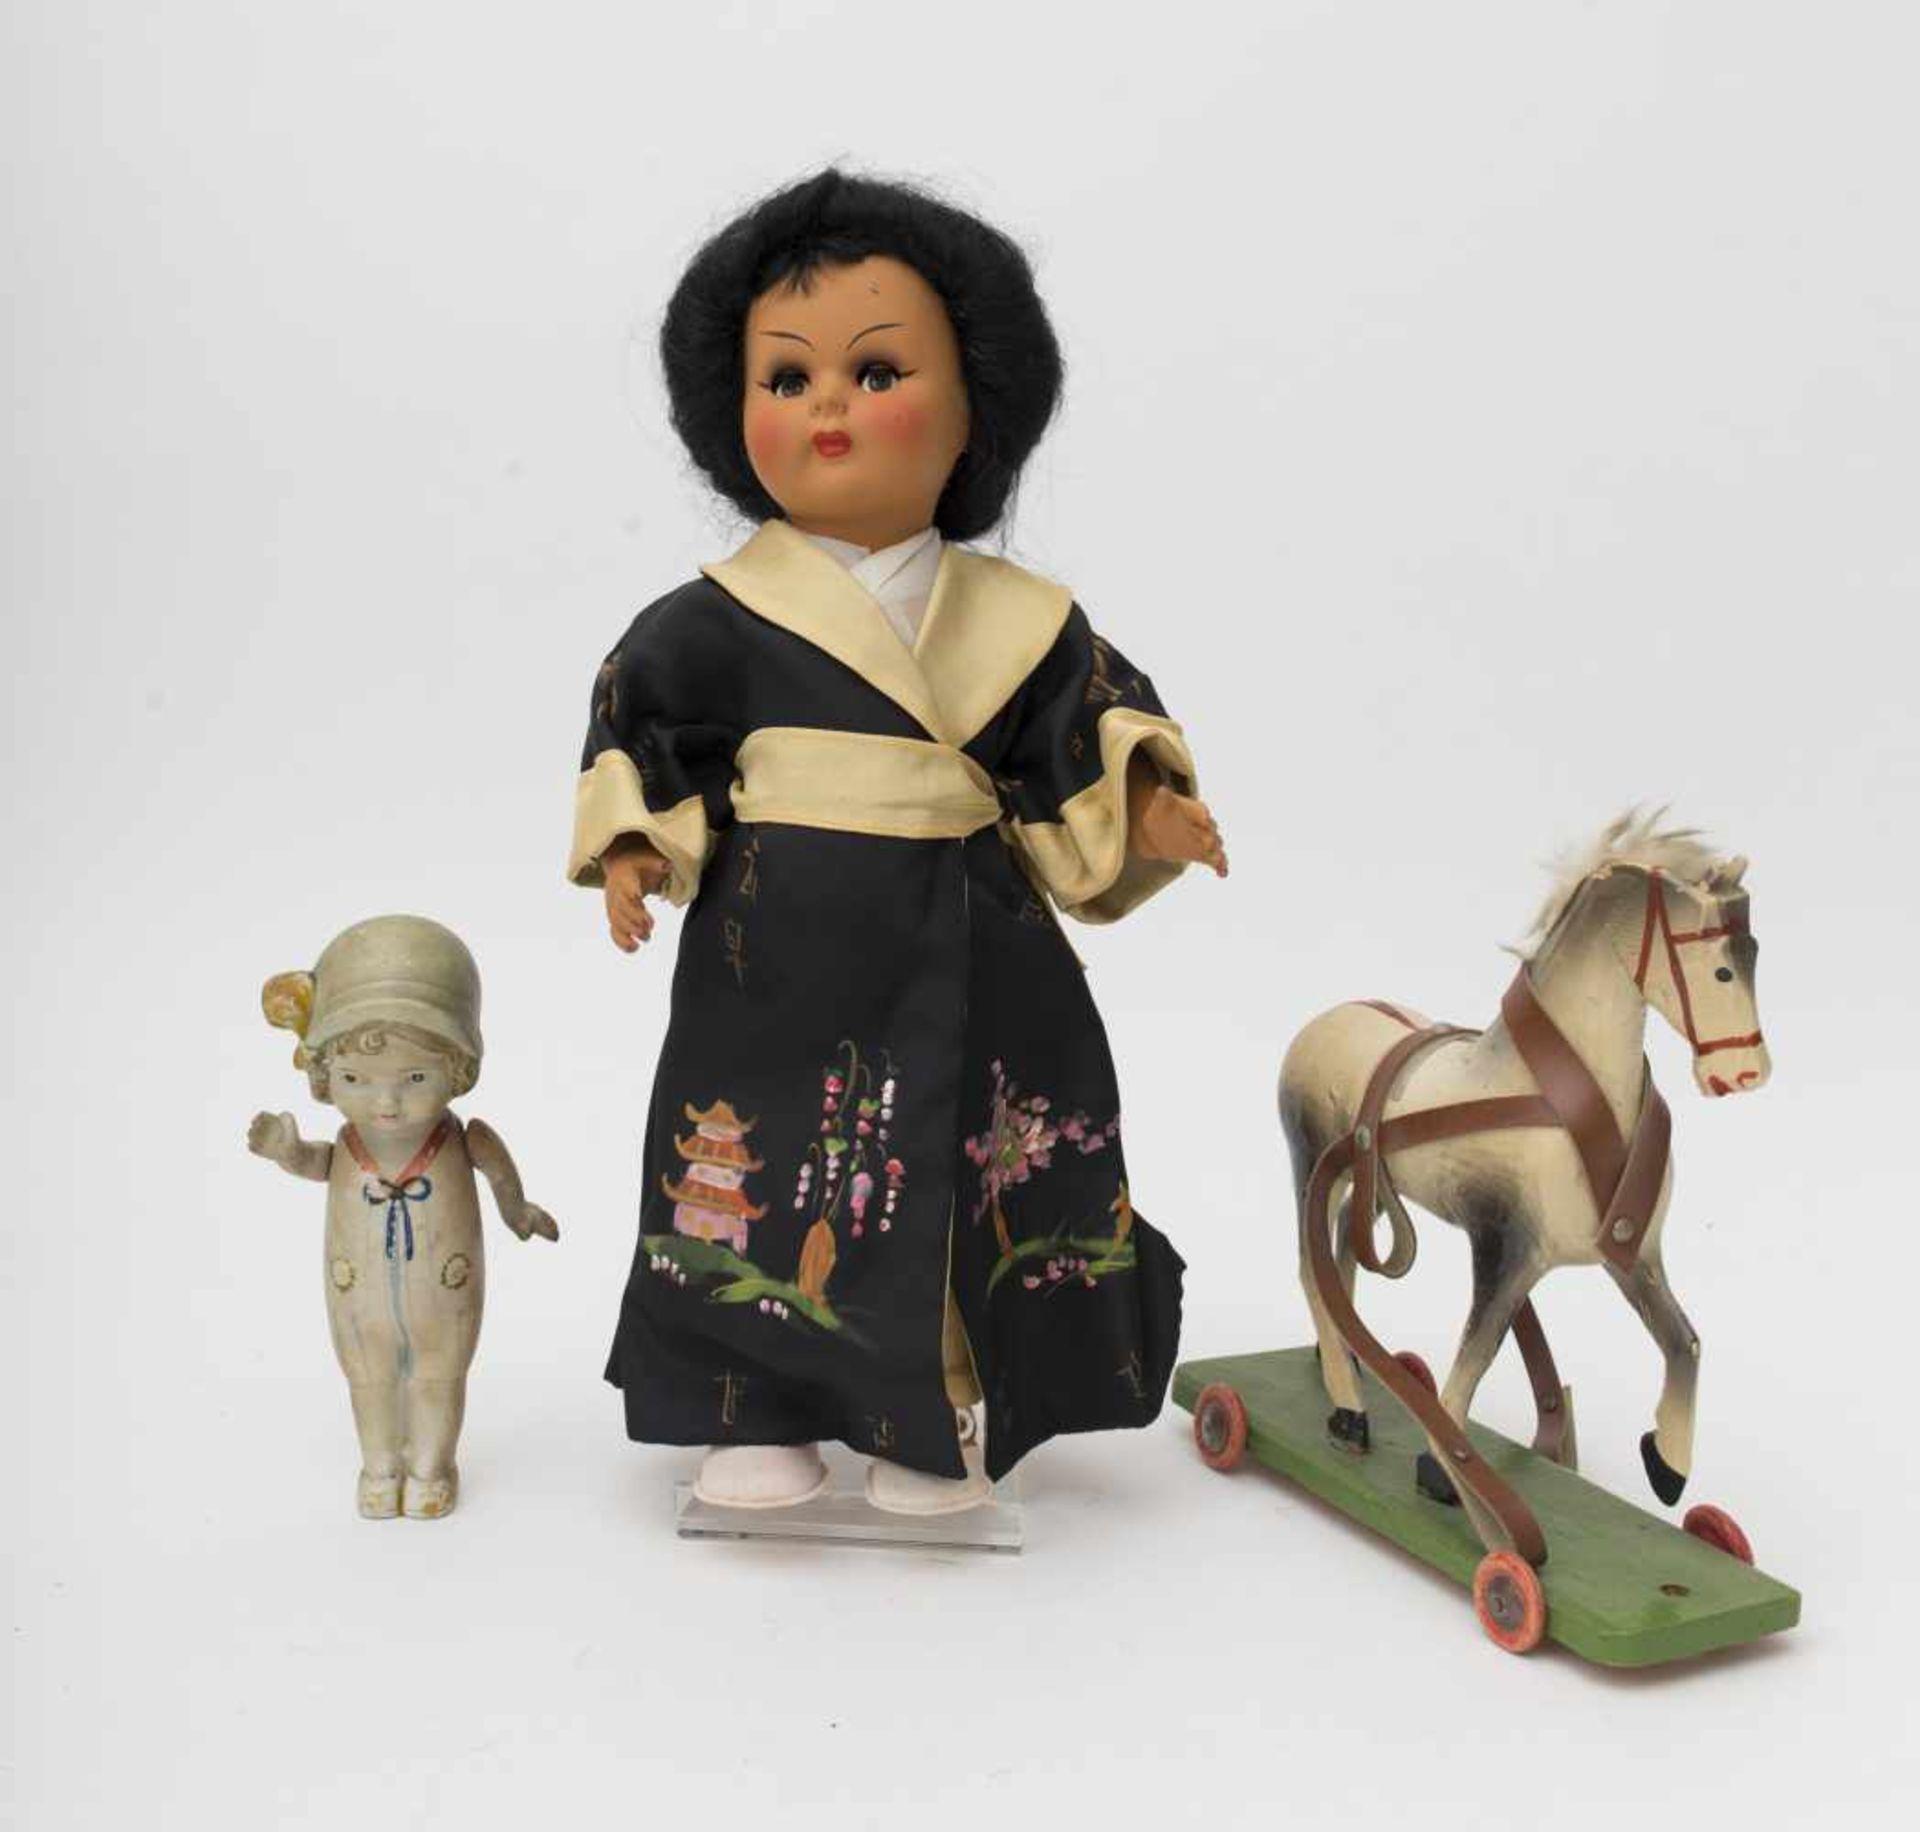 RATTI Japanese doll Of Italian make, ref. 3270/37 (bo). Papier-mâché horse on rolling stand, L=20cm,